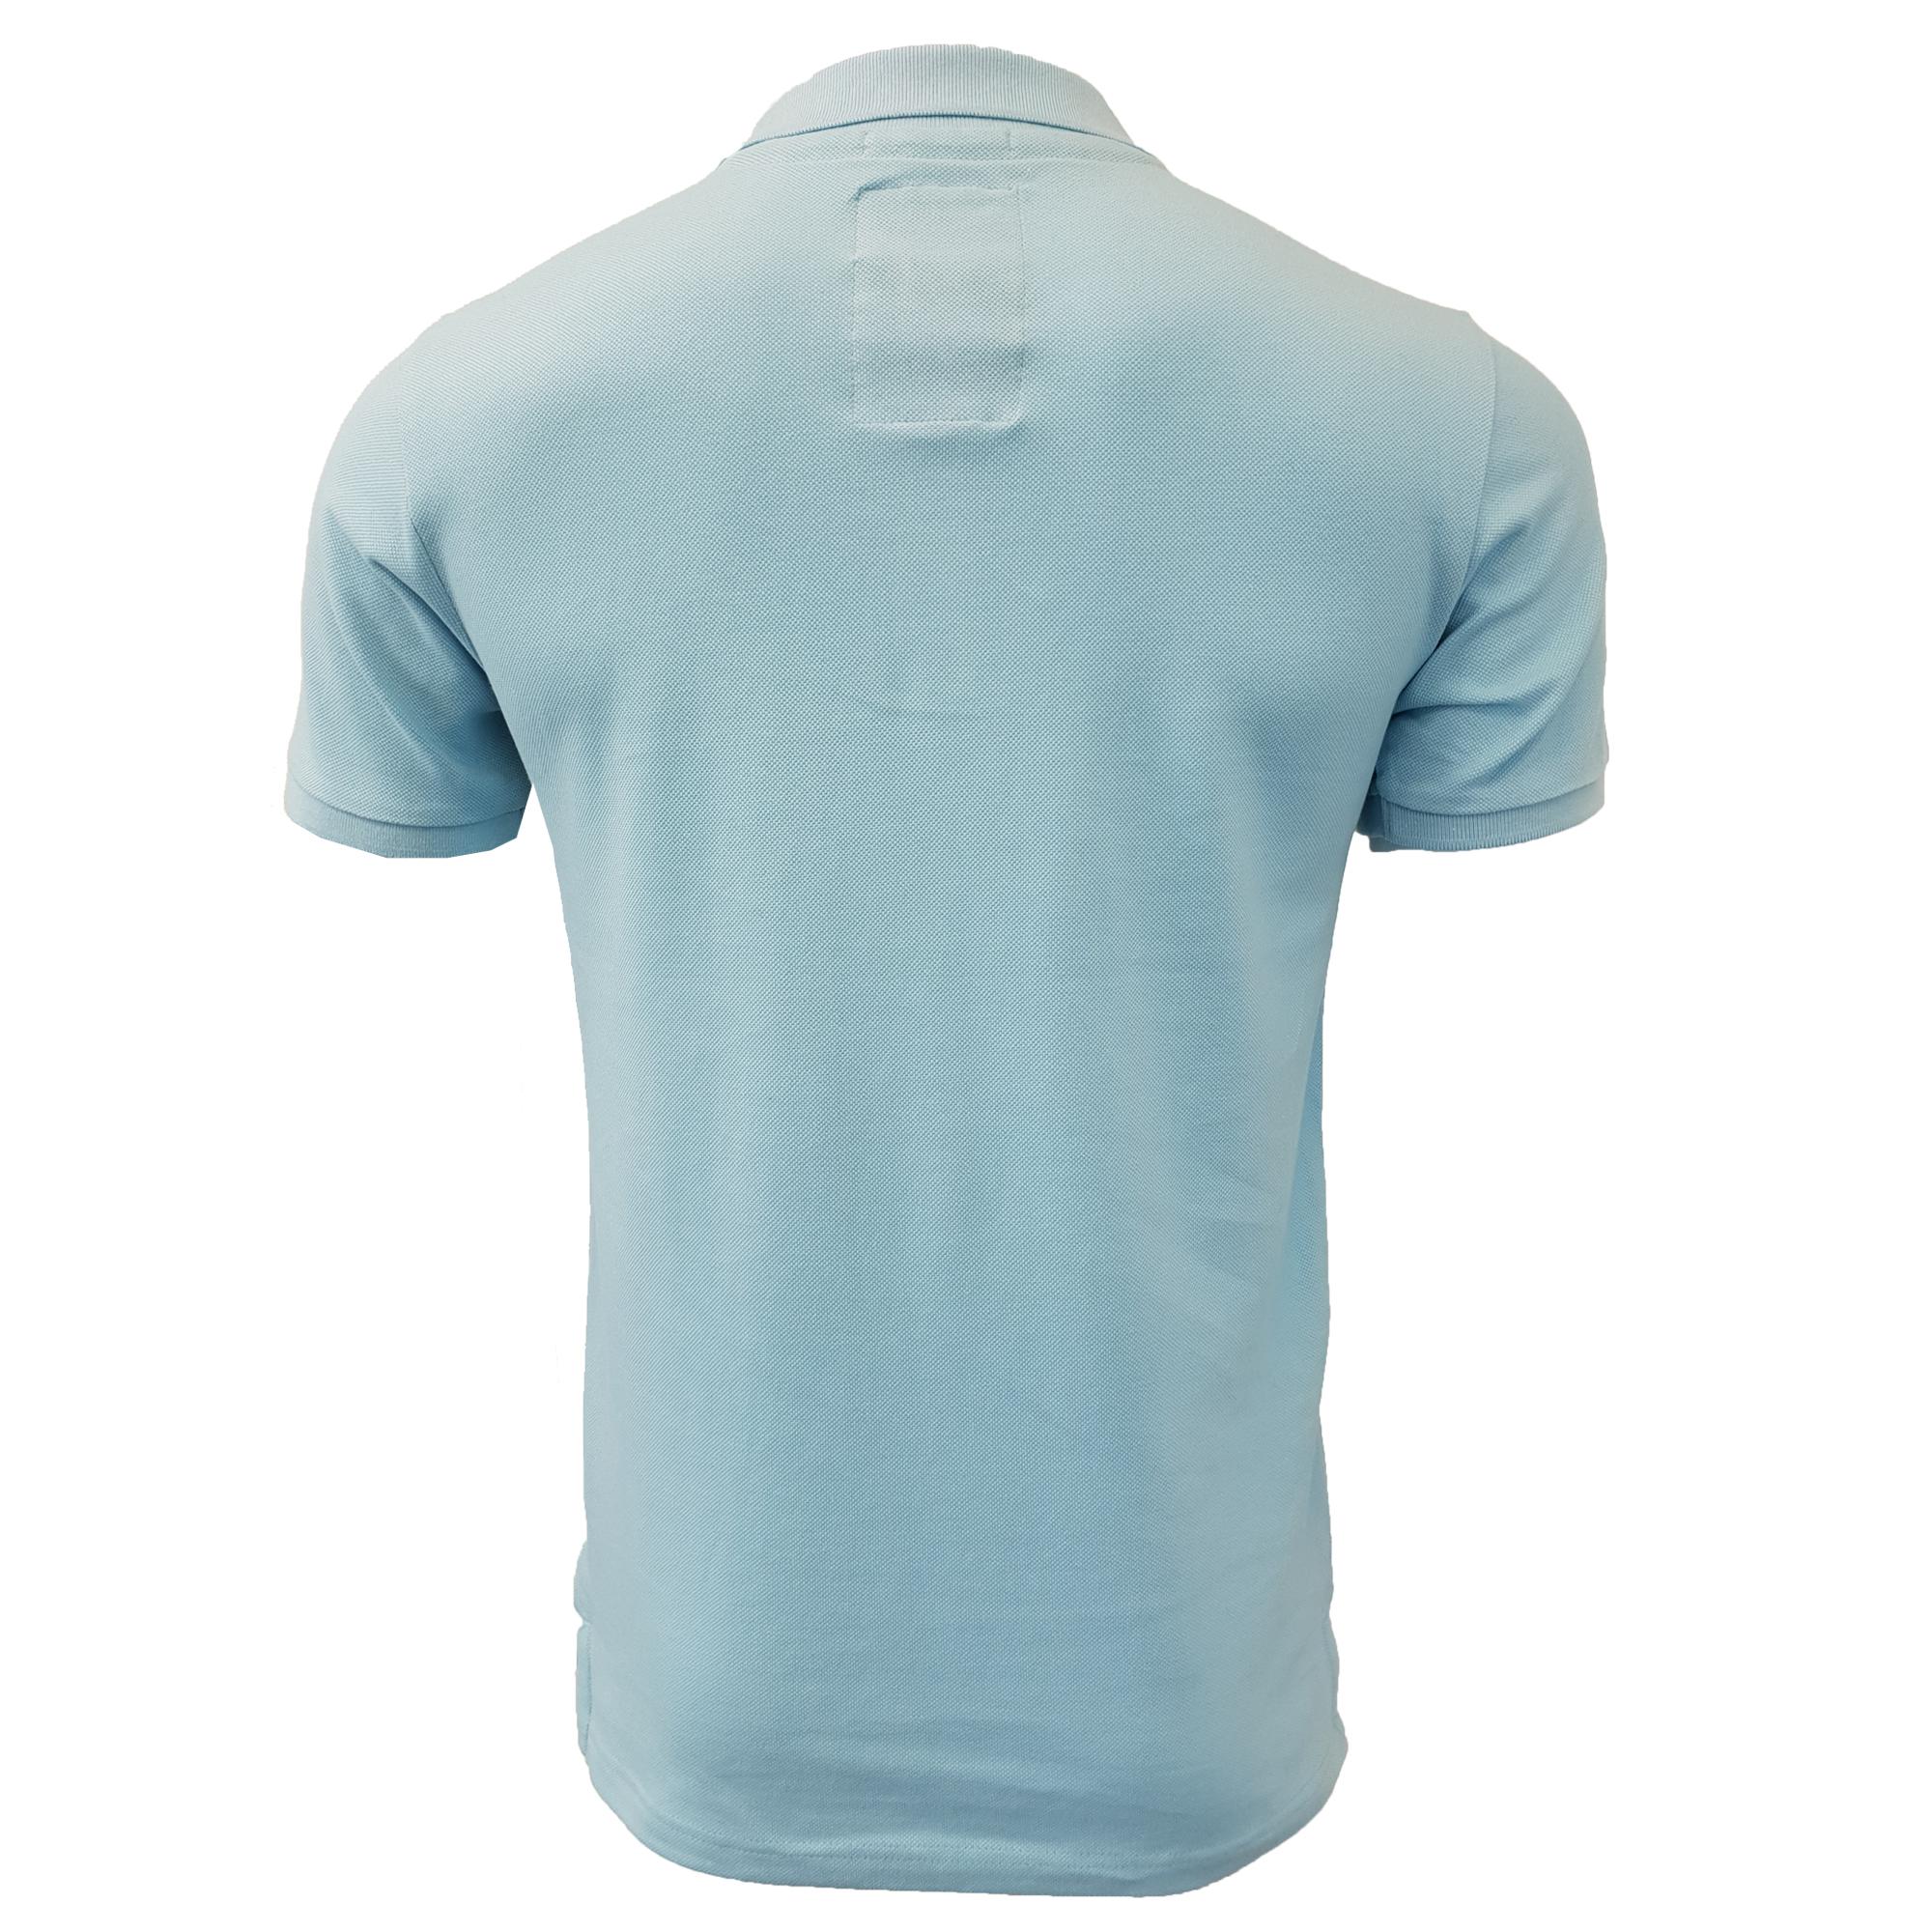 Mens-Pique-Polo-T-Shirt-Tokyo-Laundry-Florenzi-Short-Sleeved-Top-Casual-Summer thumbnail 4